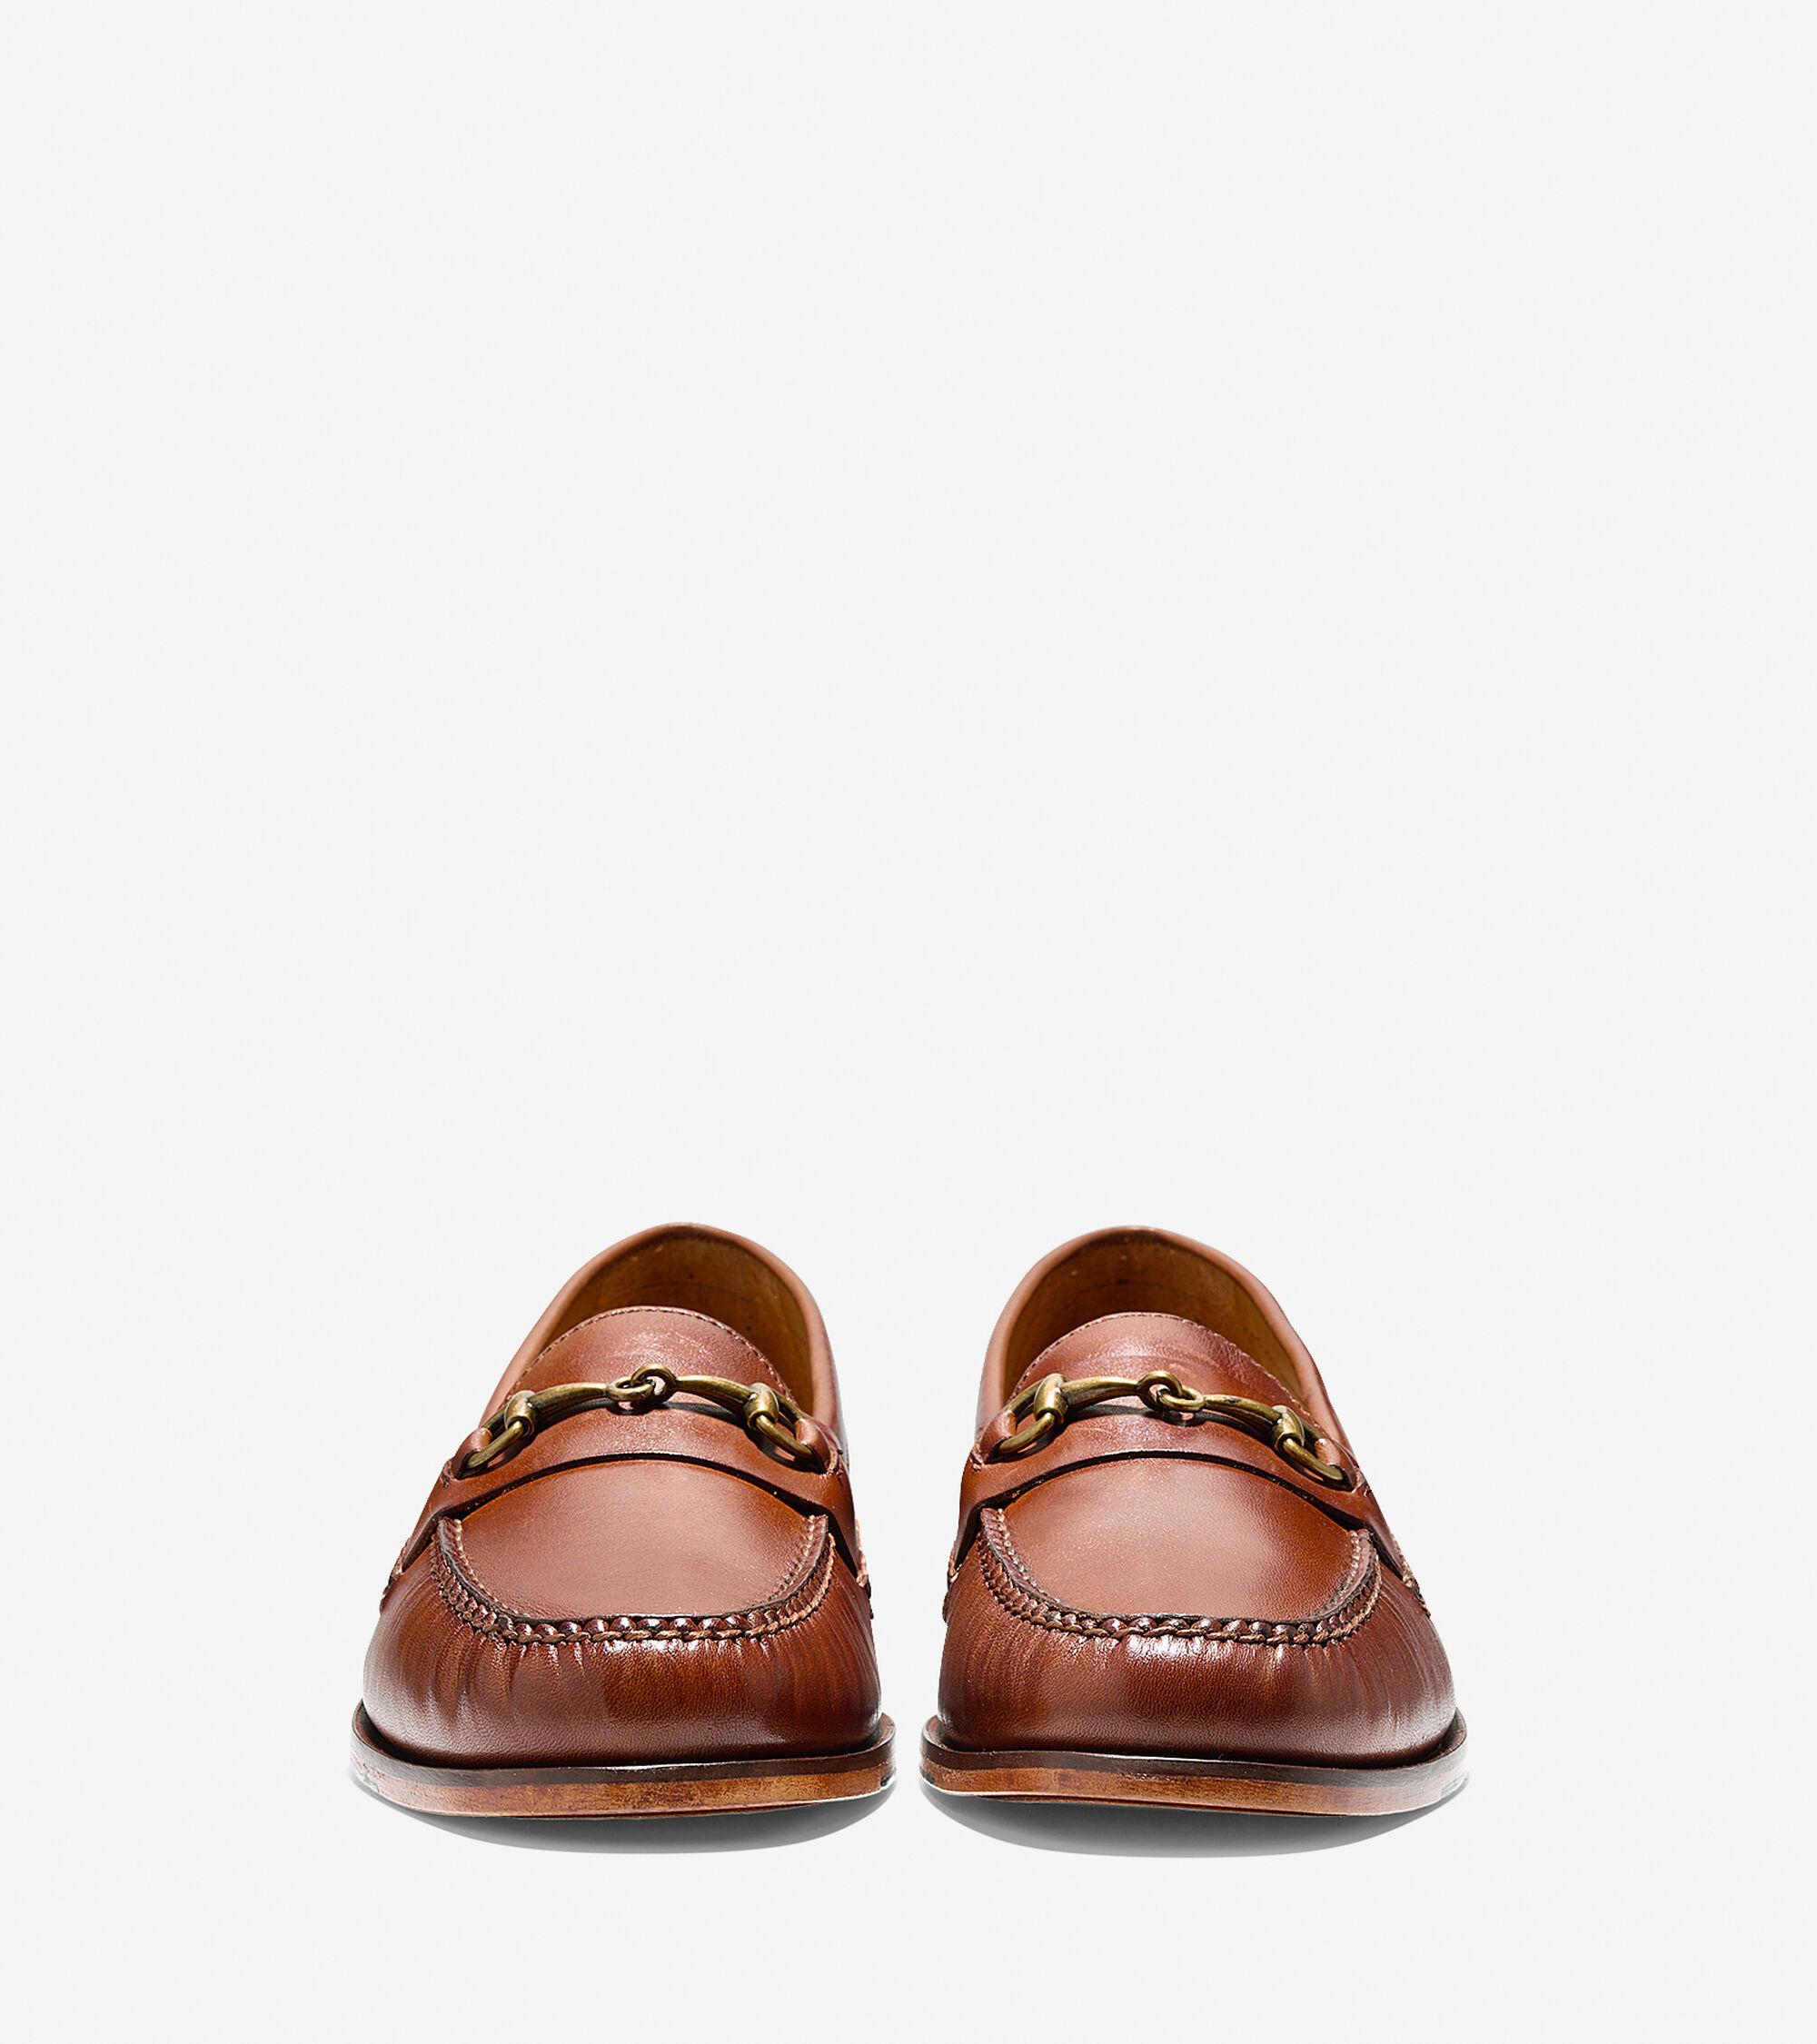 6481874cfbf Mens Pinch Grand Penny Bit Loafers in Papaya